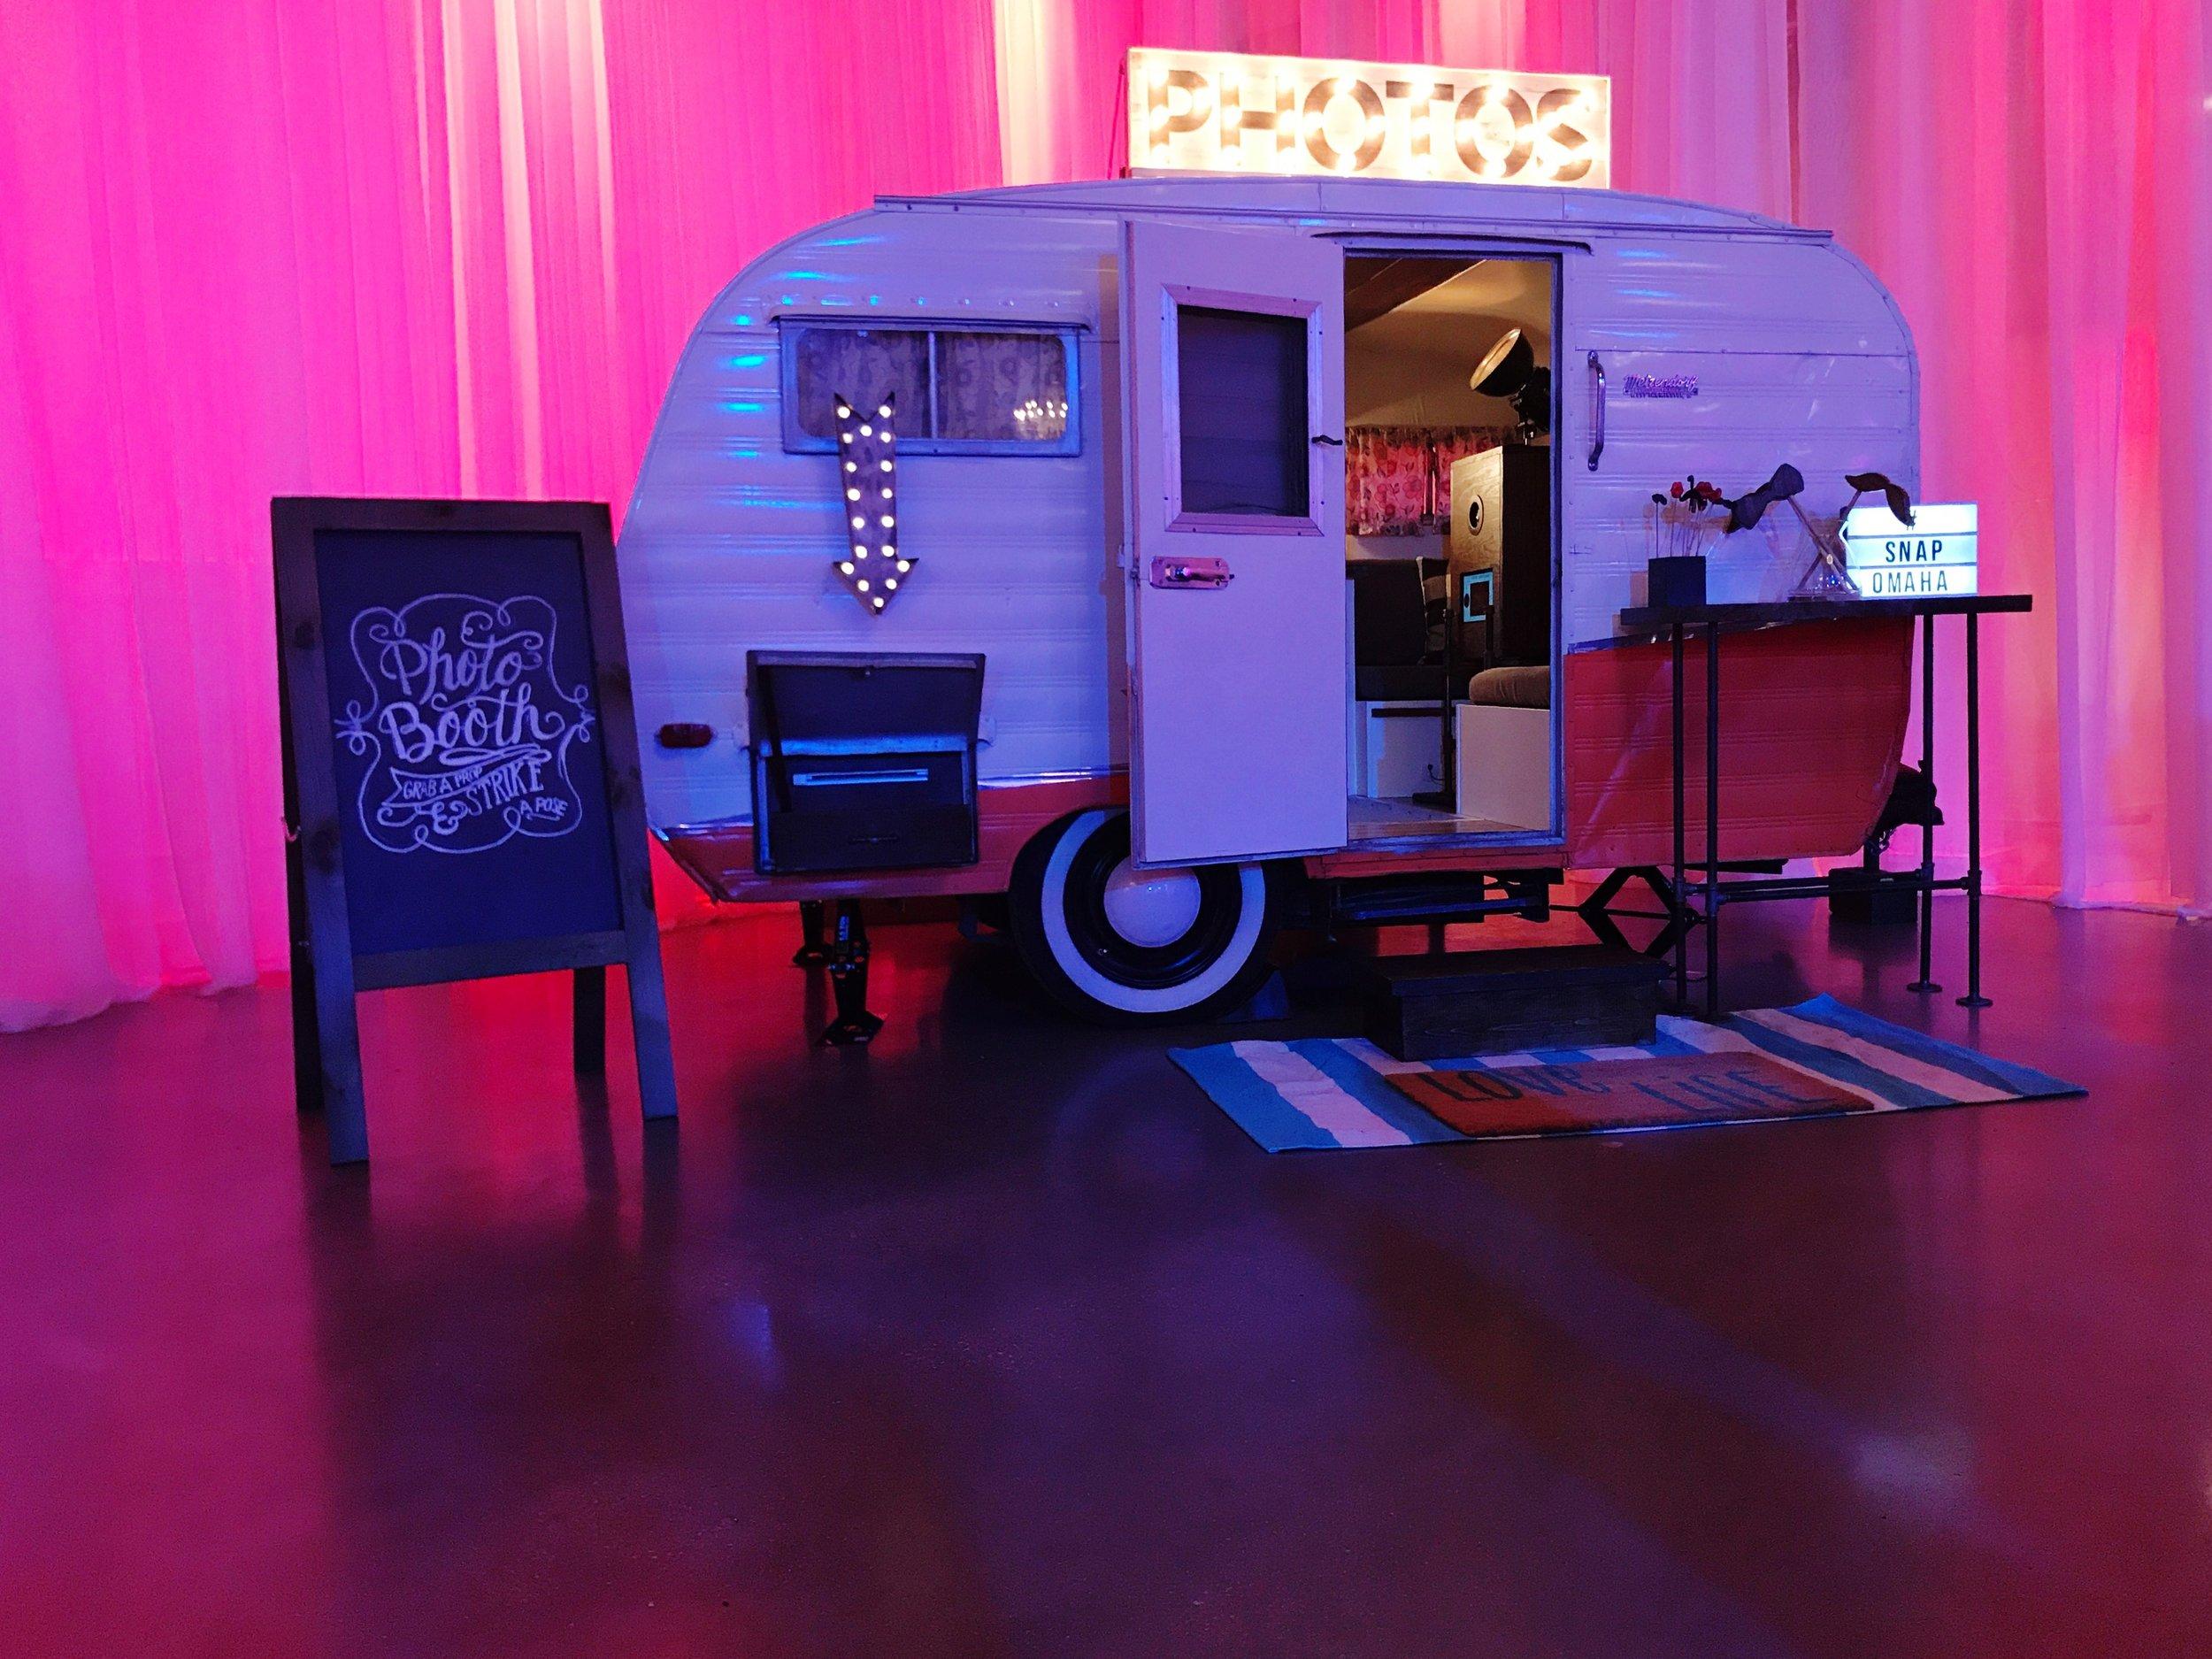 omaha design center-omaha-nebraska-event-snap omaha-photo booth